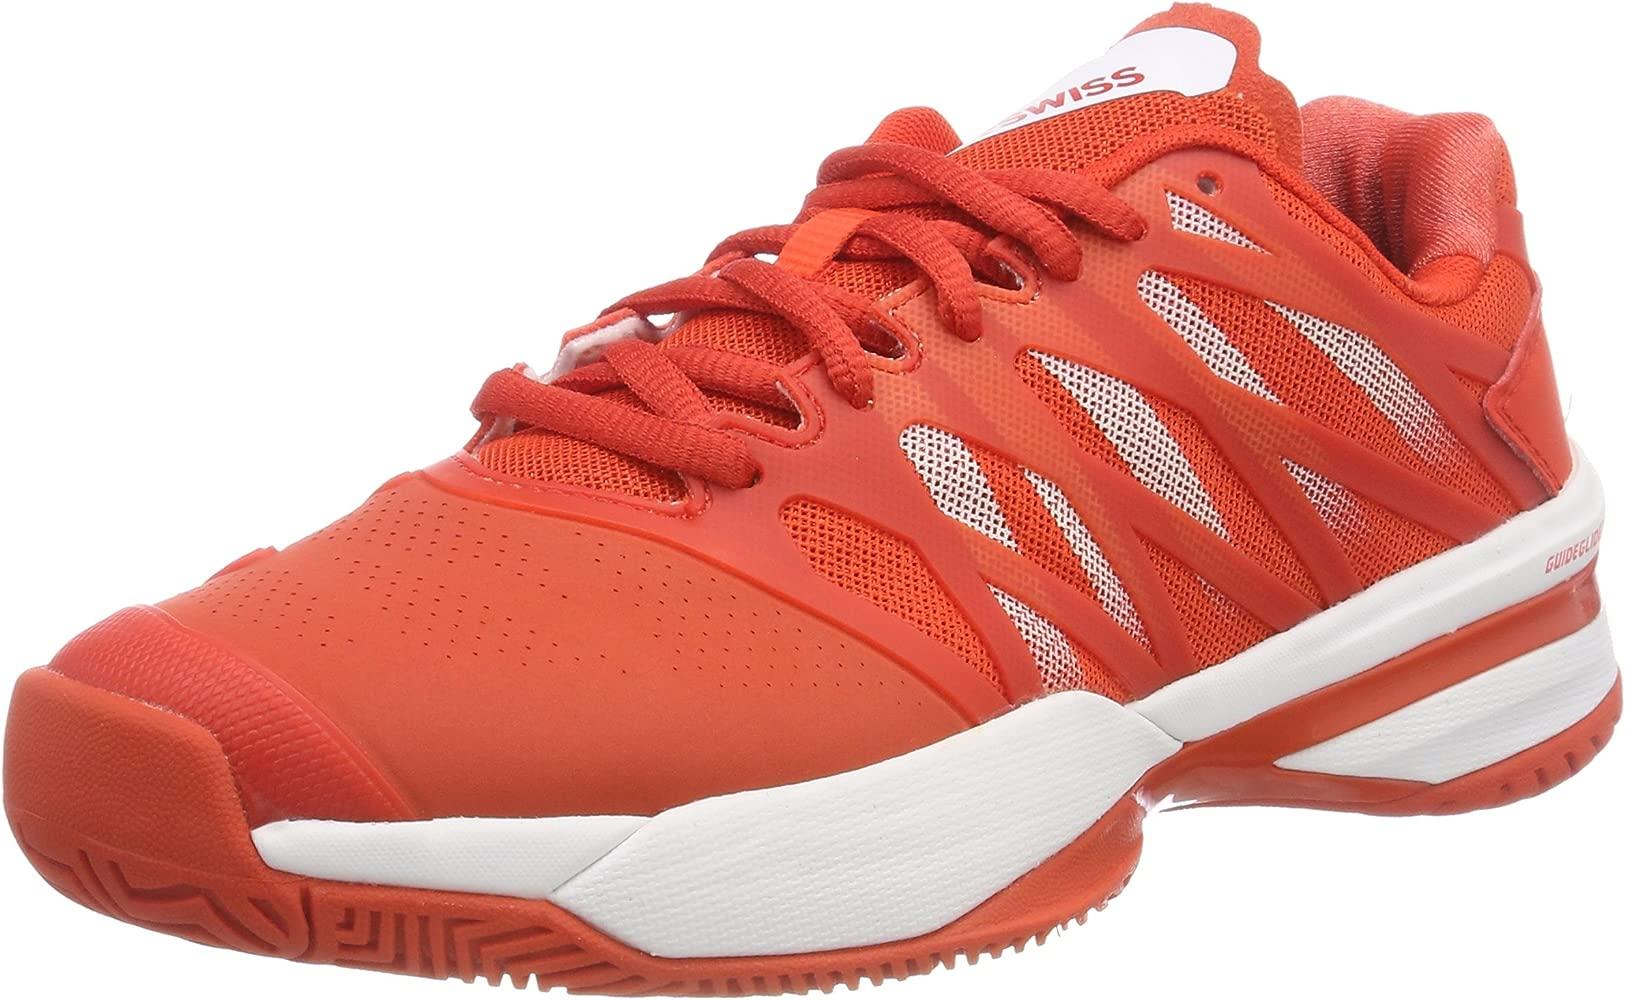 K-Swiss Performance KS Tfw Ultrashot, Zapatillas de Tenis para Mujer